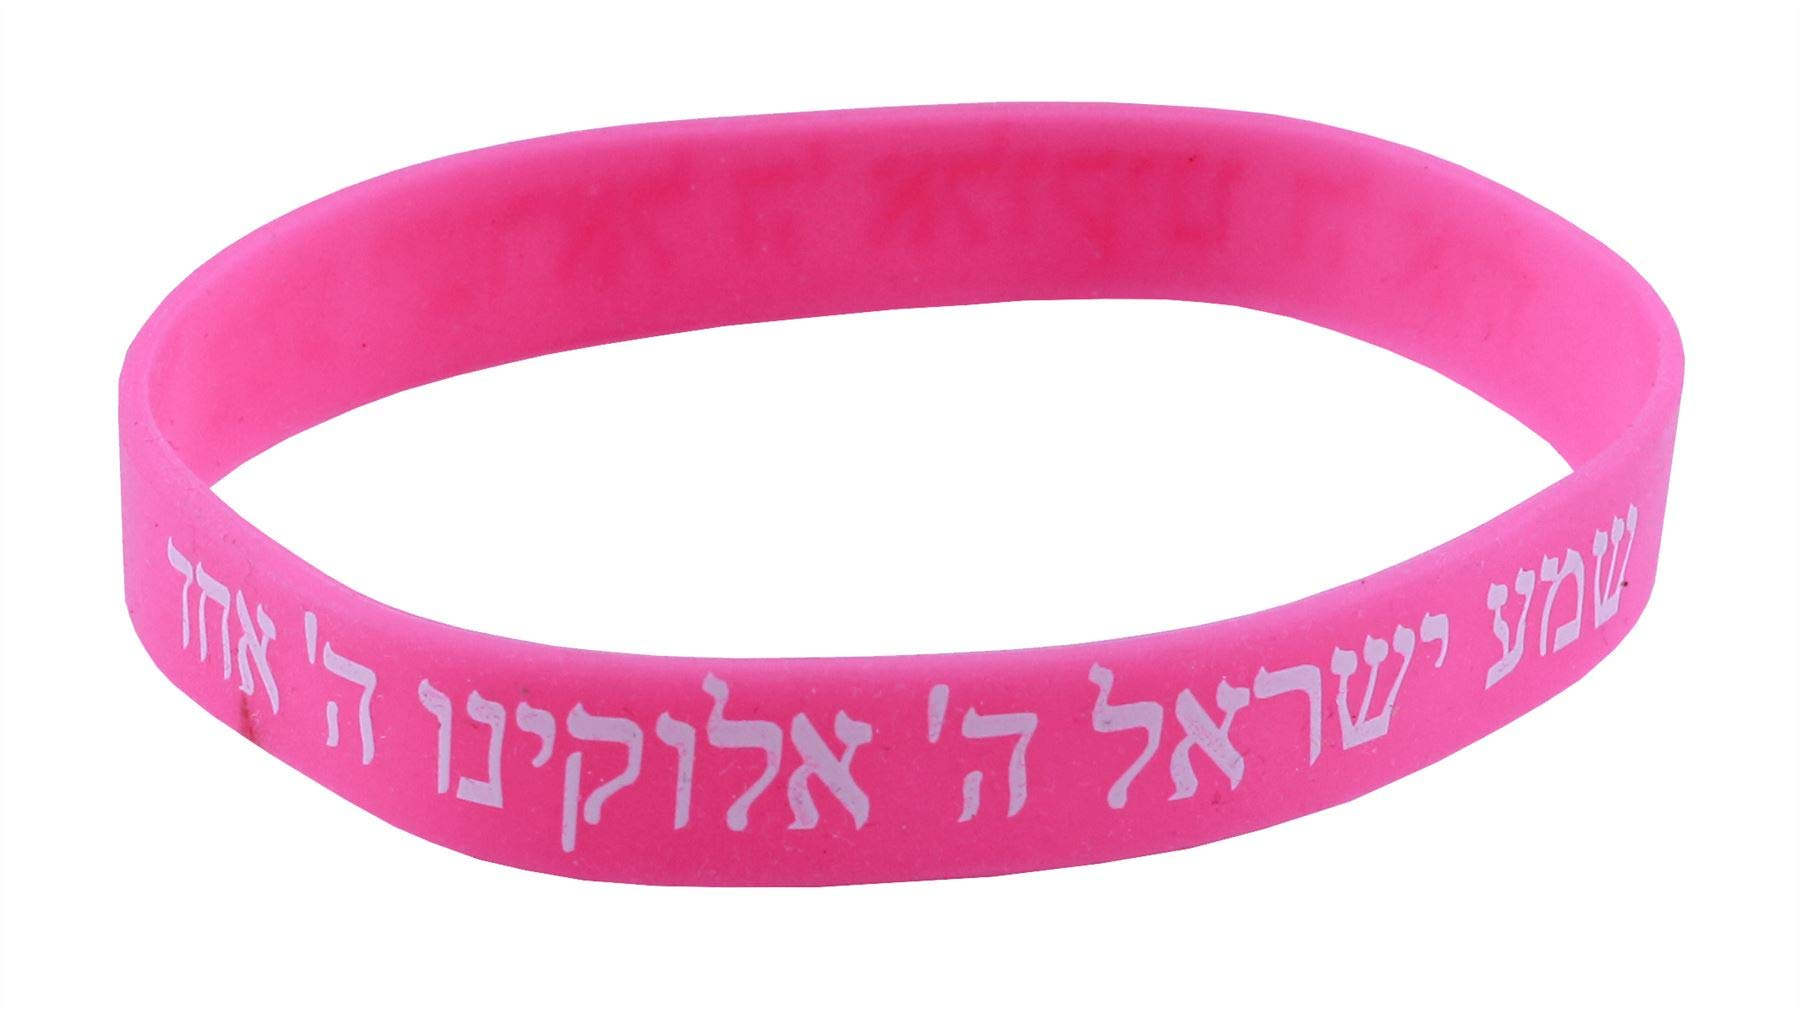 Pink Shema Israel Rubber Bracelet Hebrew Jewish Kabbalah Judaica Wristband by Body-Soul-n-Spirit Bracelet (Image #1)